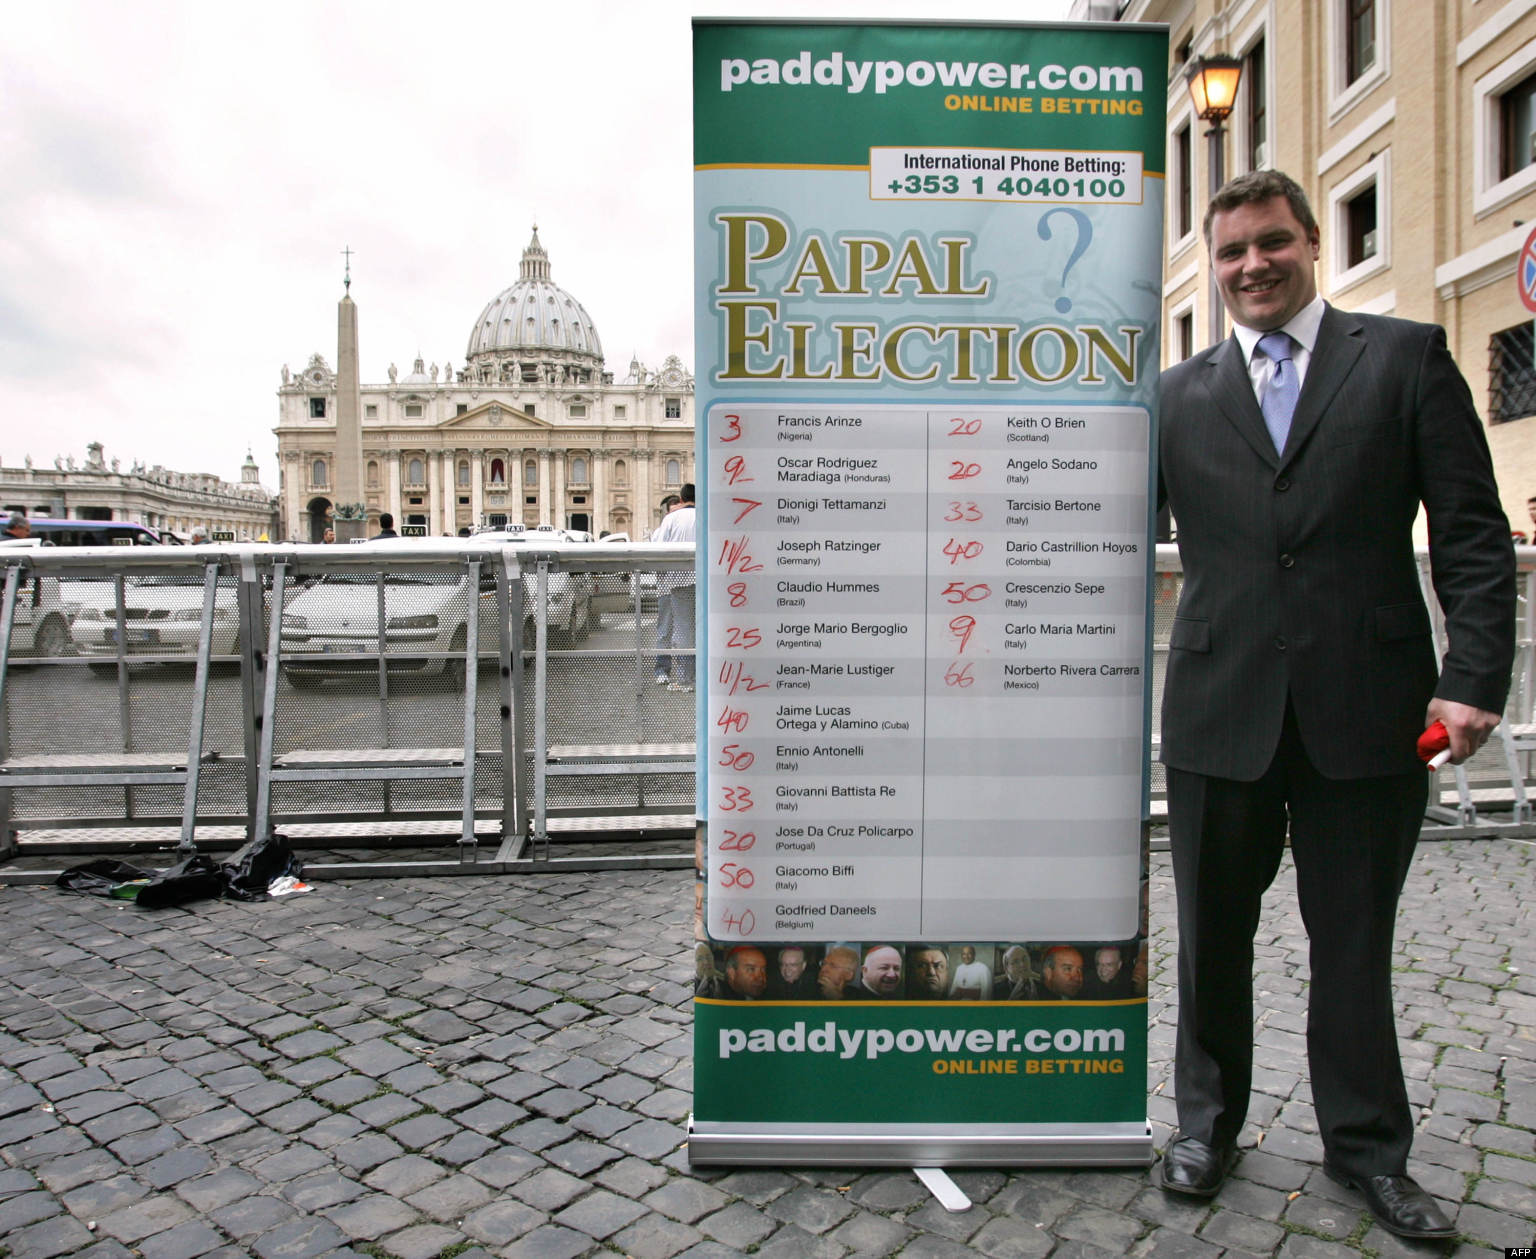 rencontre pape francois benoit xvi